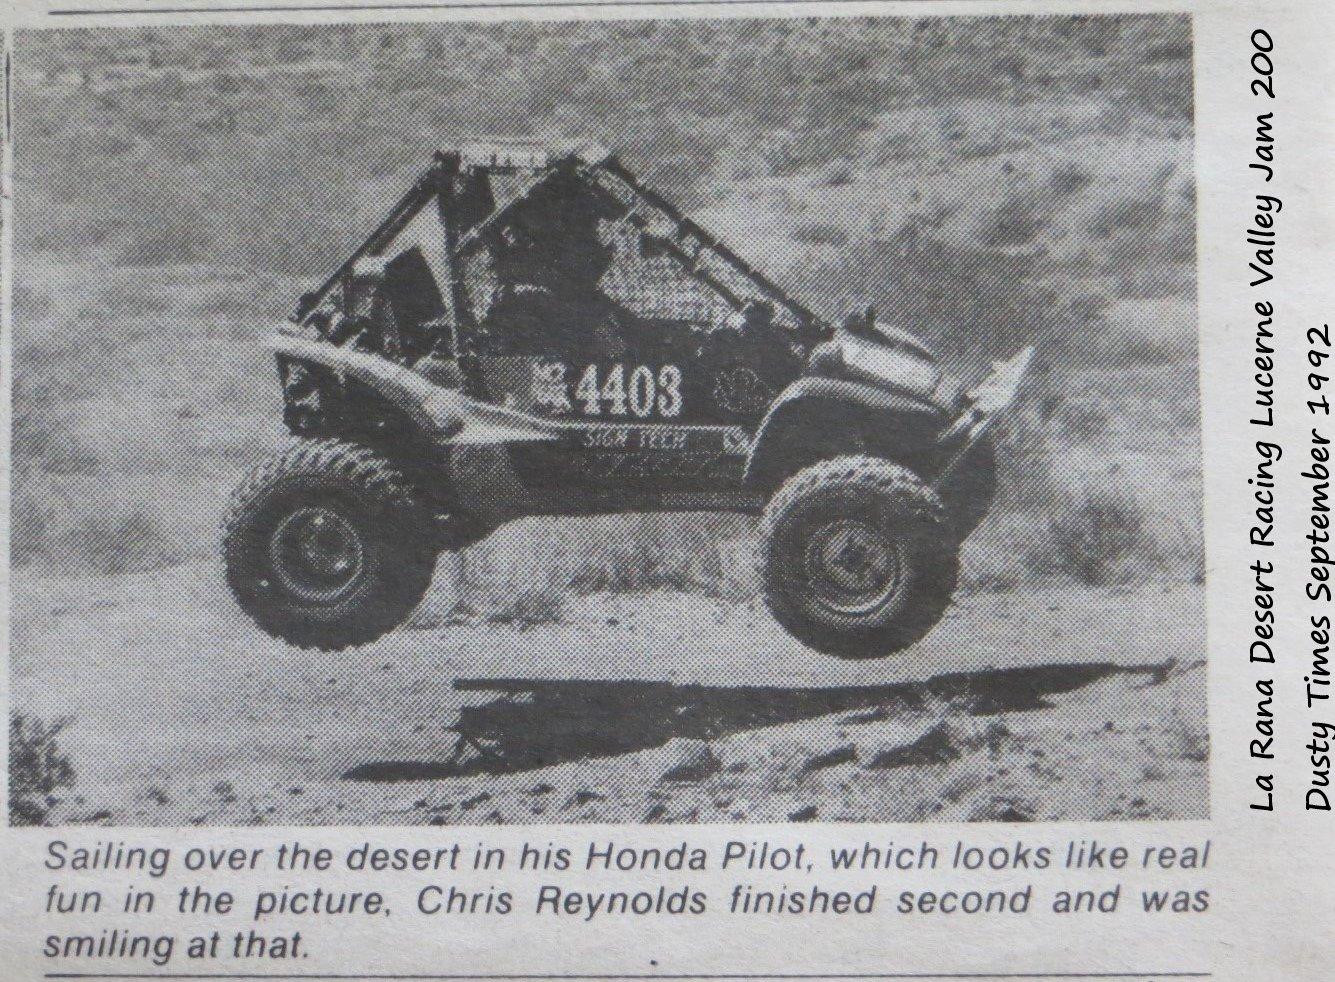 La Rana Desert Racing 1991-92 Christopher Reynolds-3.jpg